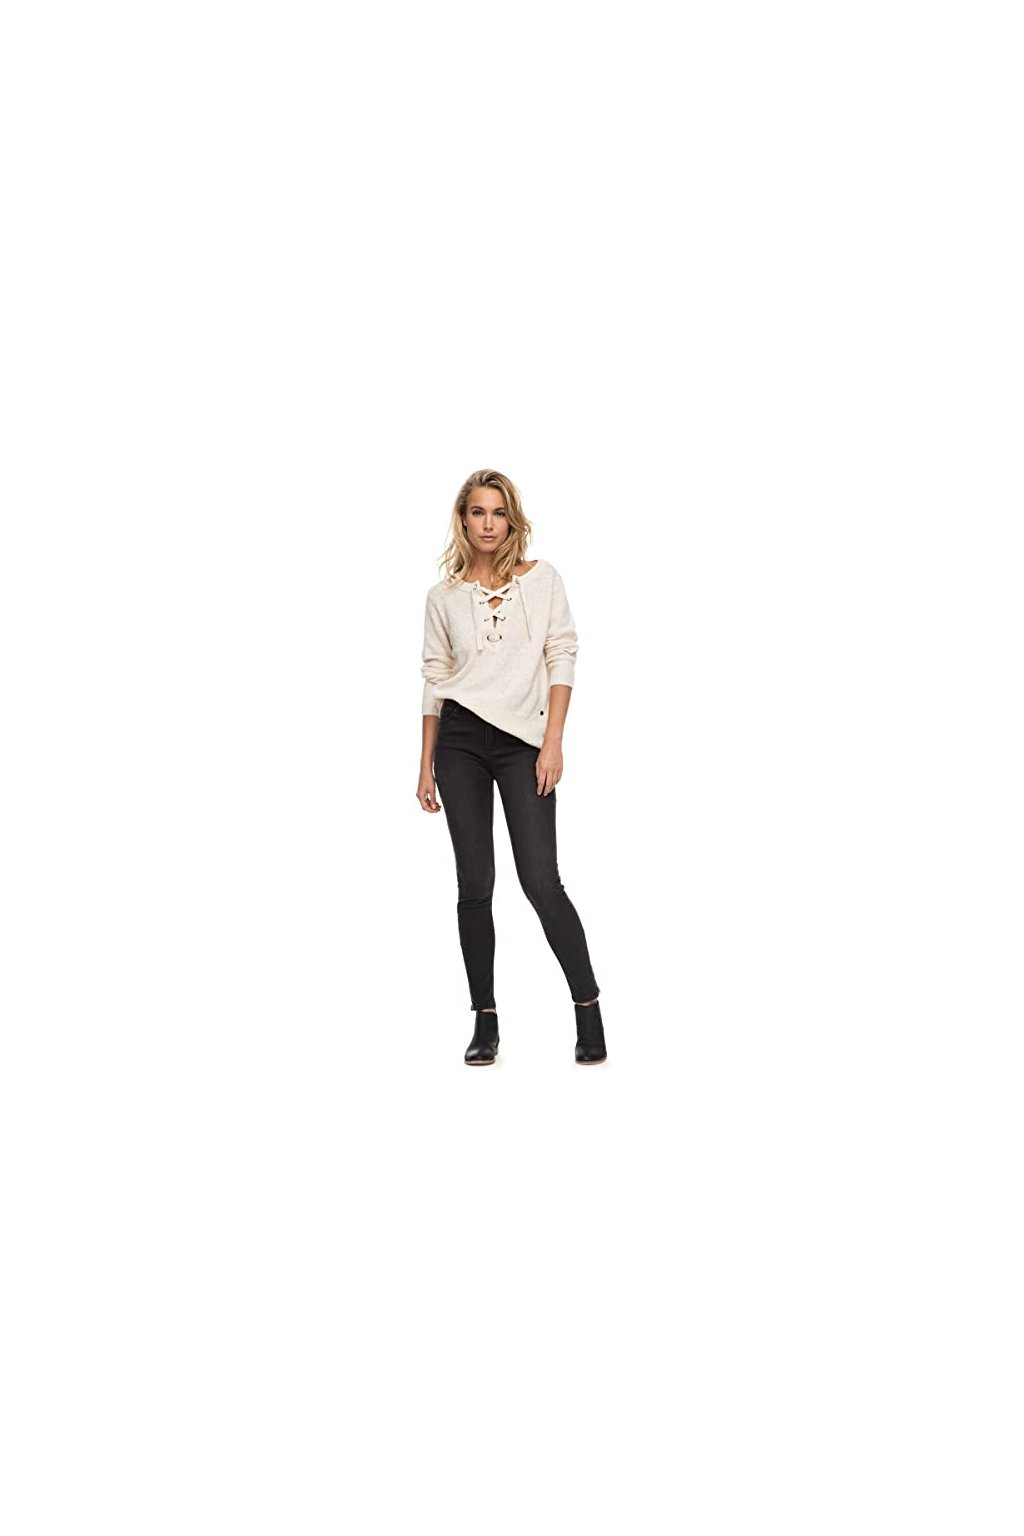 Dámské kalhoty Roxy ERJDP03168